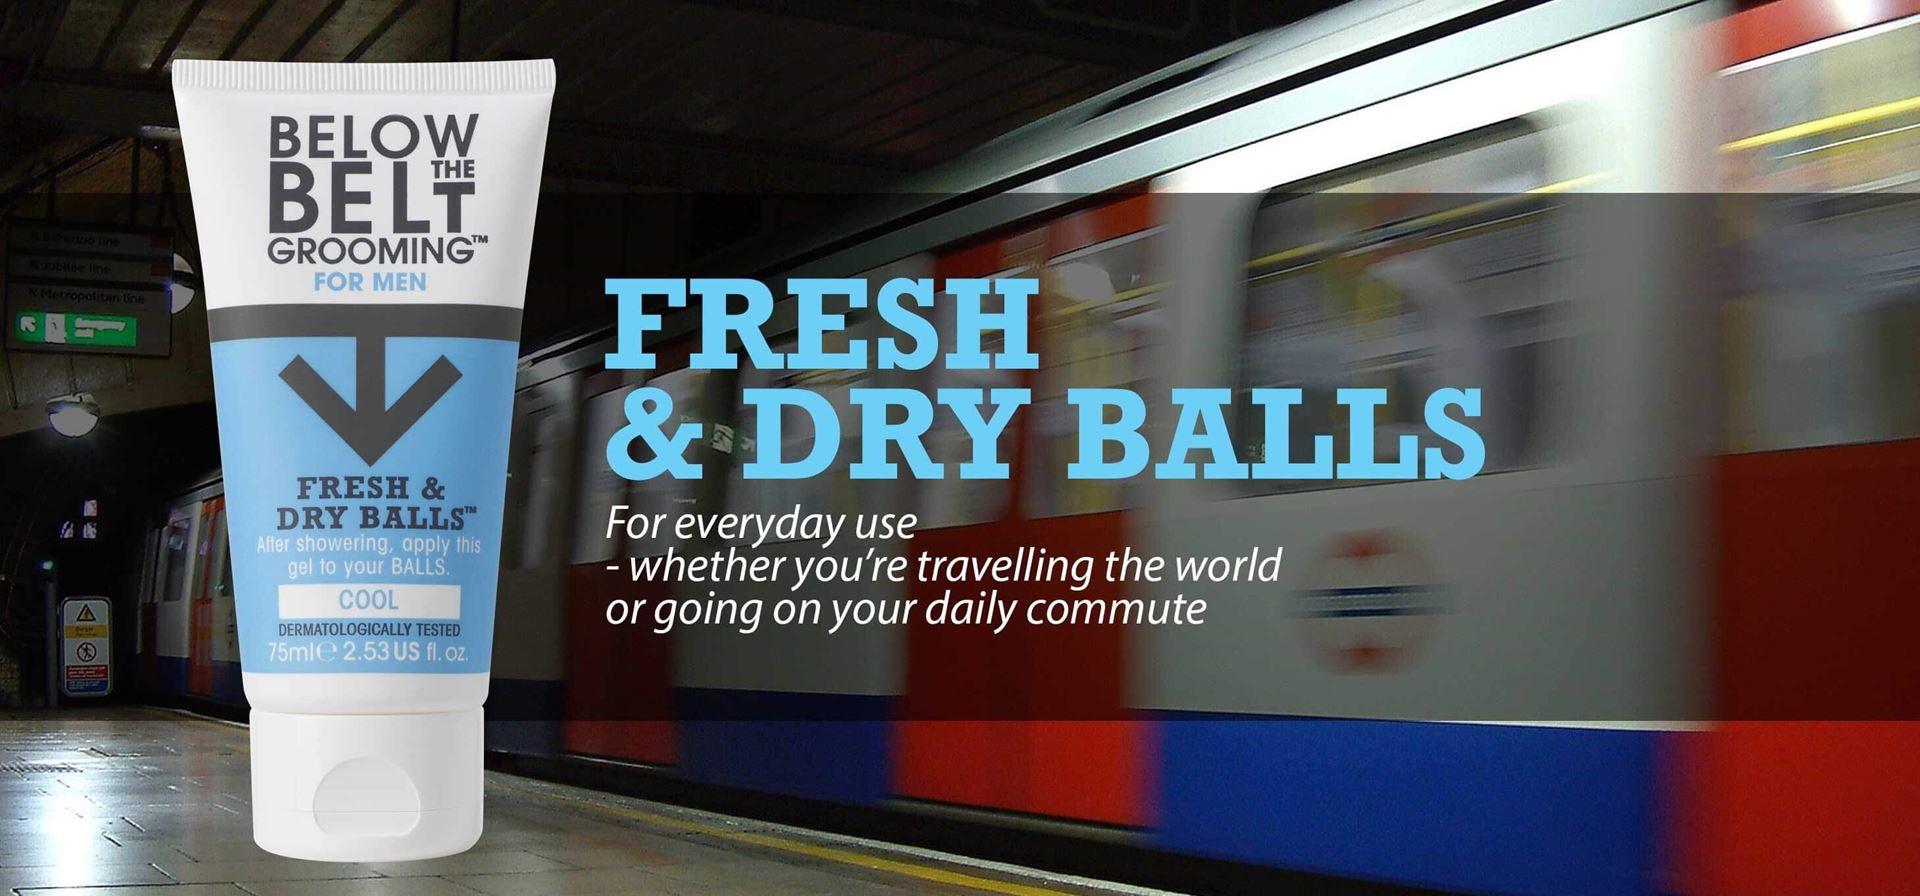 Fresh and dry balls